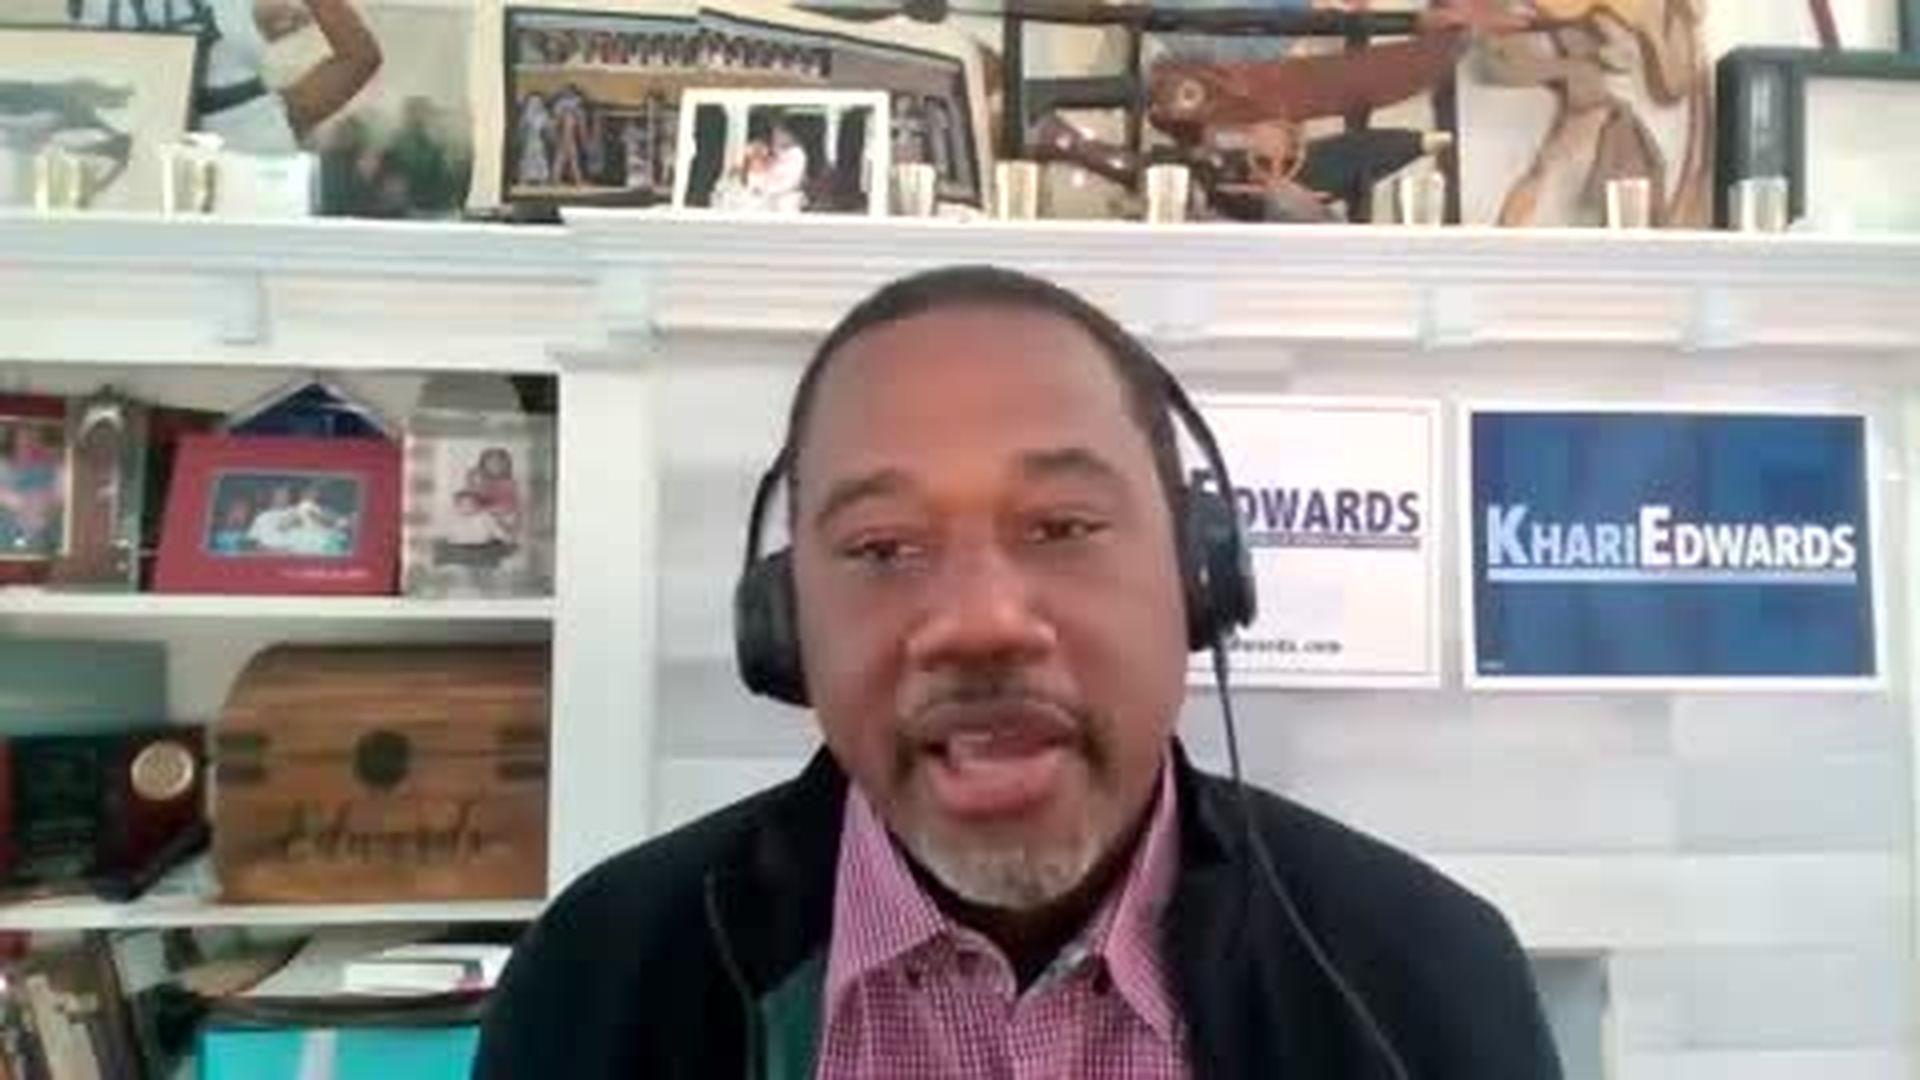 Khari Edwards   Democratic Candidate for Brooklyn Borough President